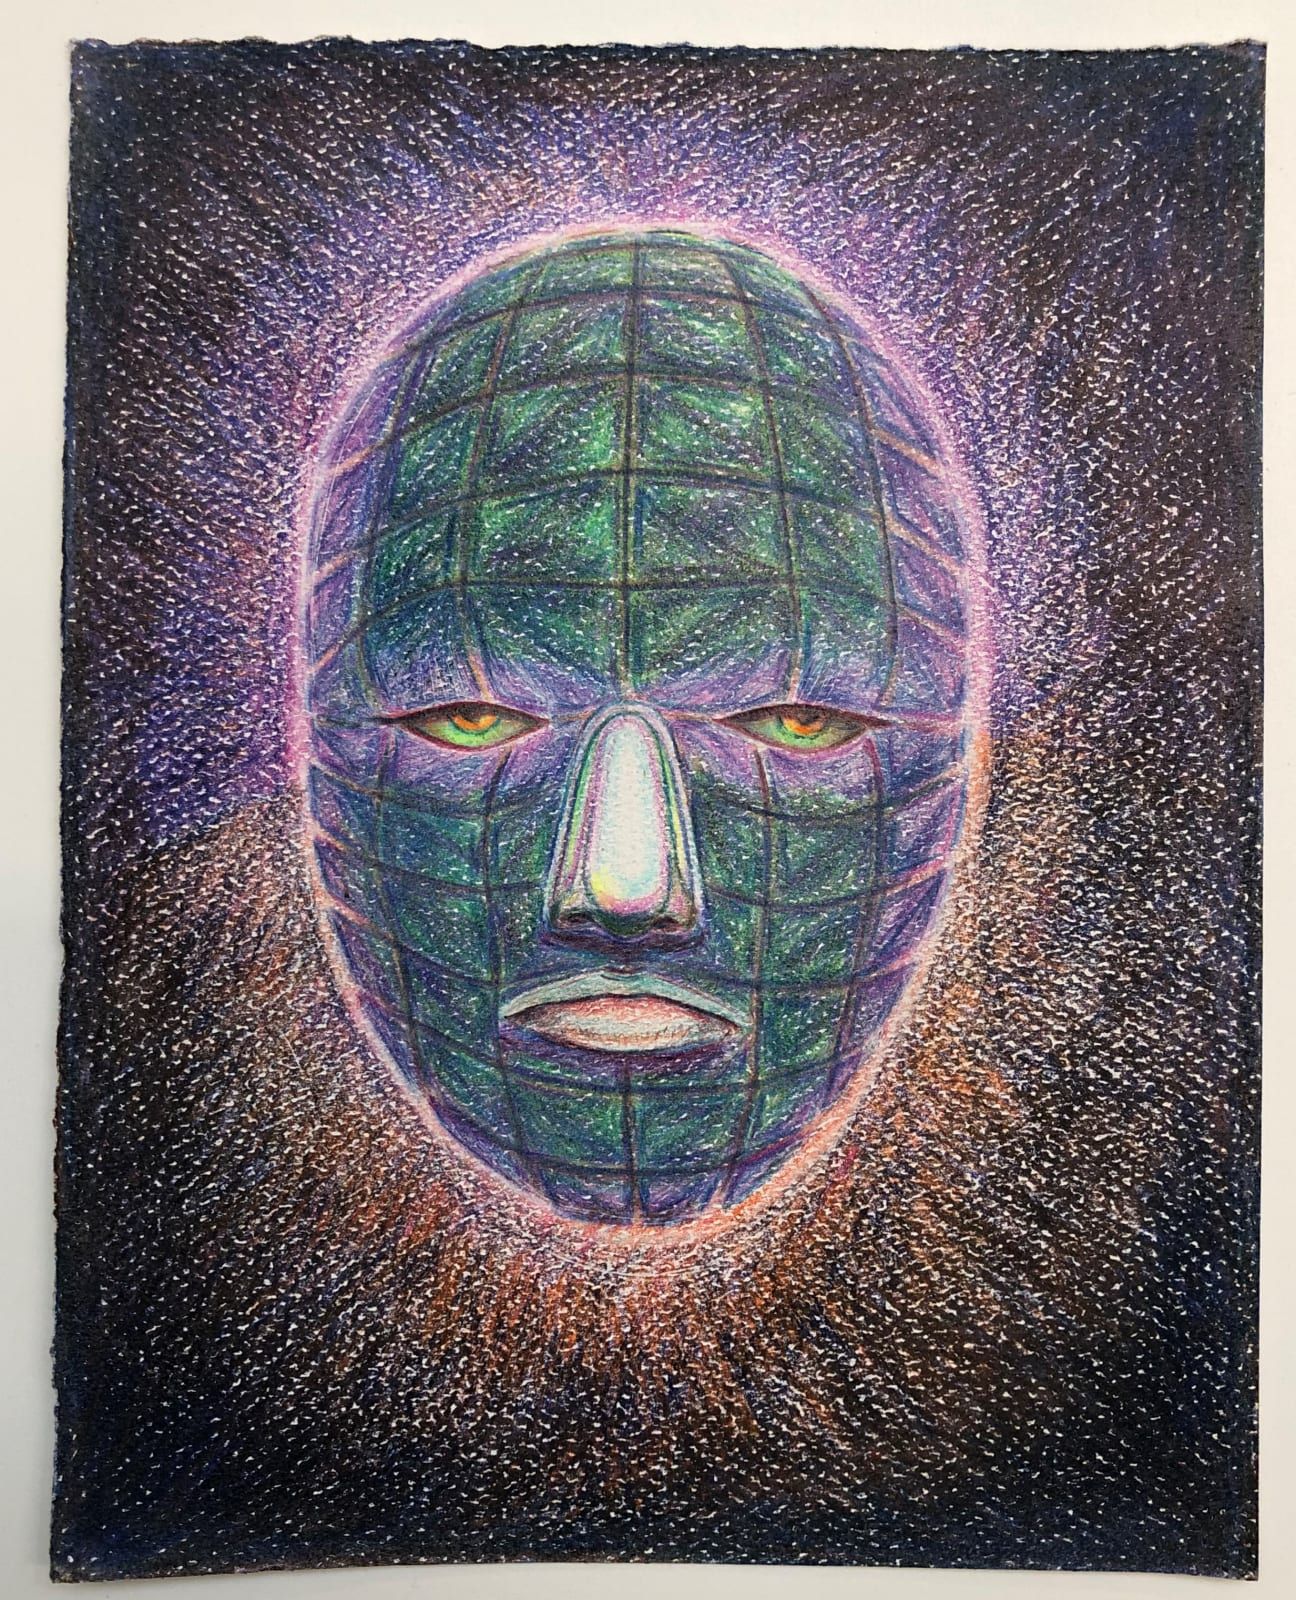 Alex Jackson Untitled Seer Seeing 2020 Jenkins Johnson Gallery